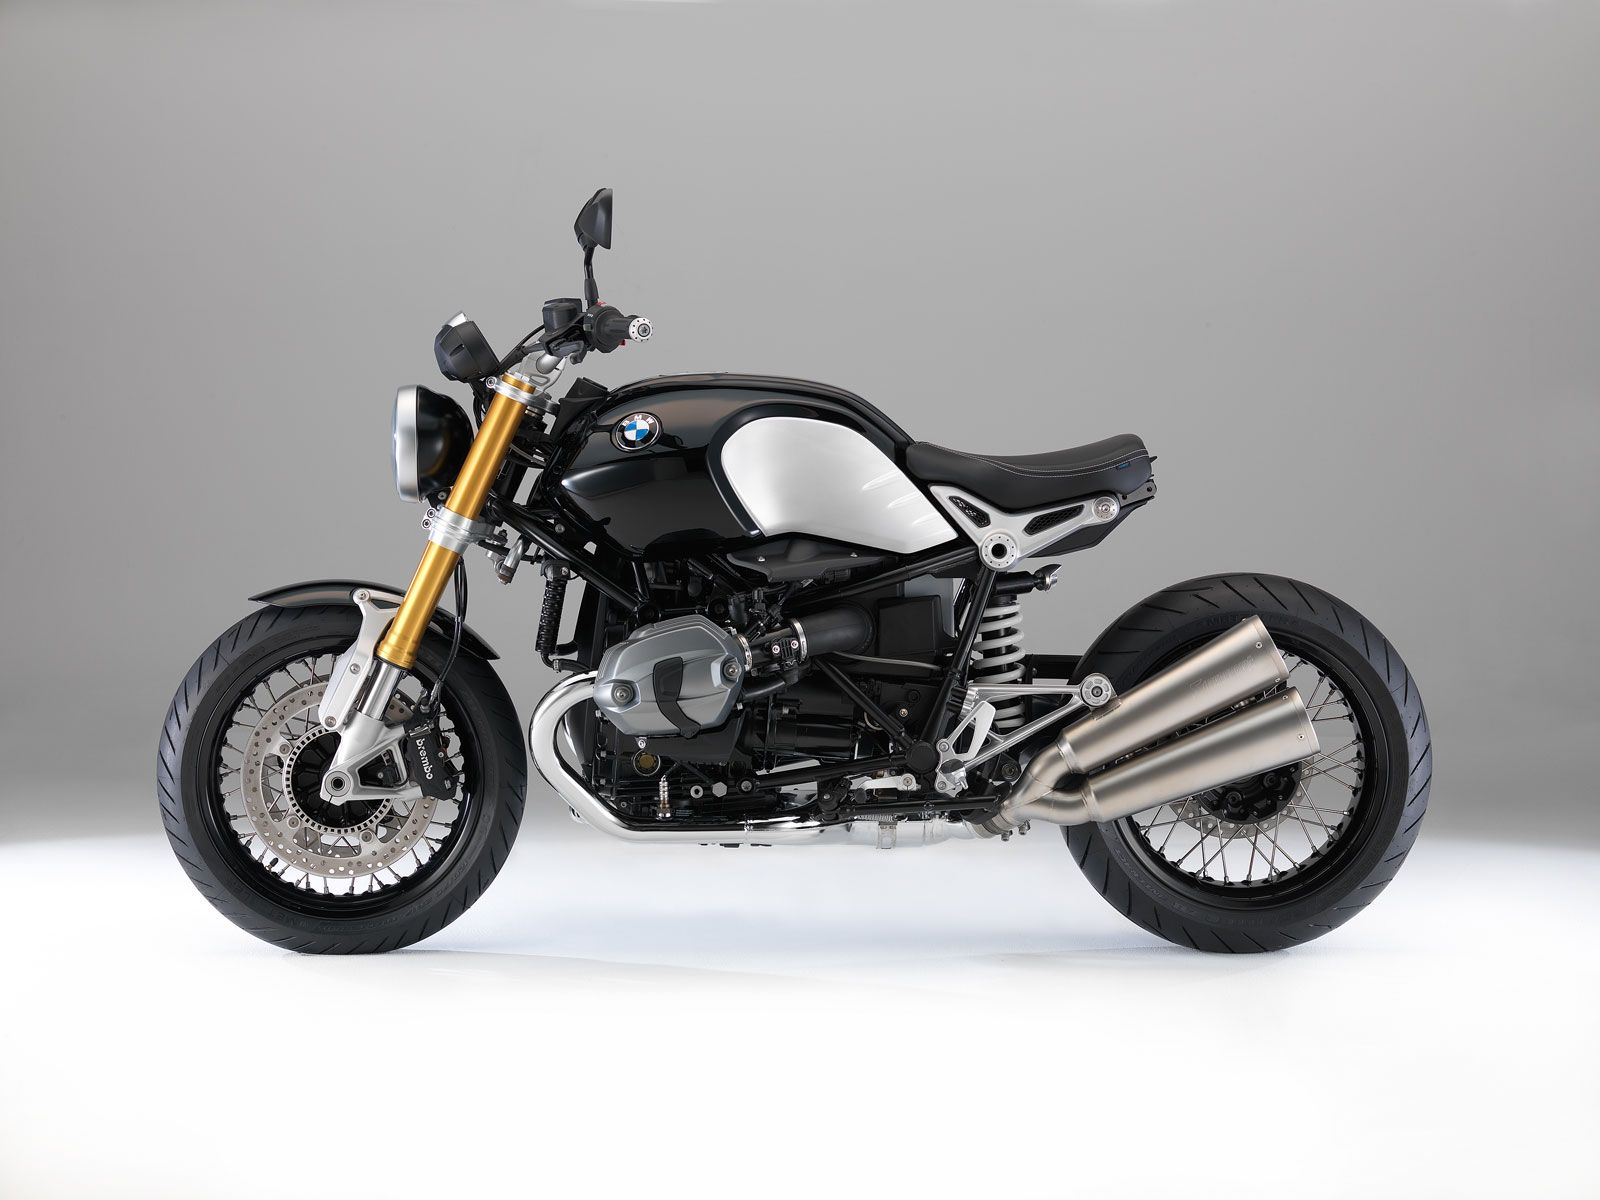 Bmw R Ninet Transport Bike Black Motocicletas Bmw Bmw Motos